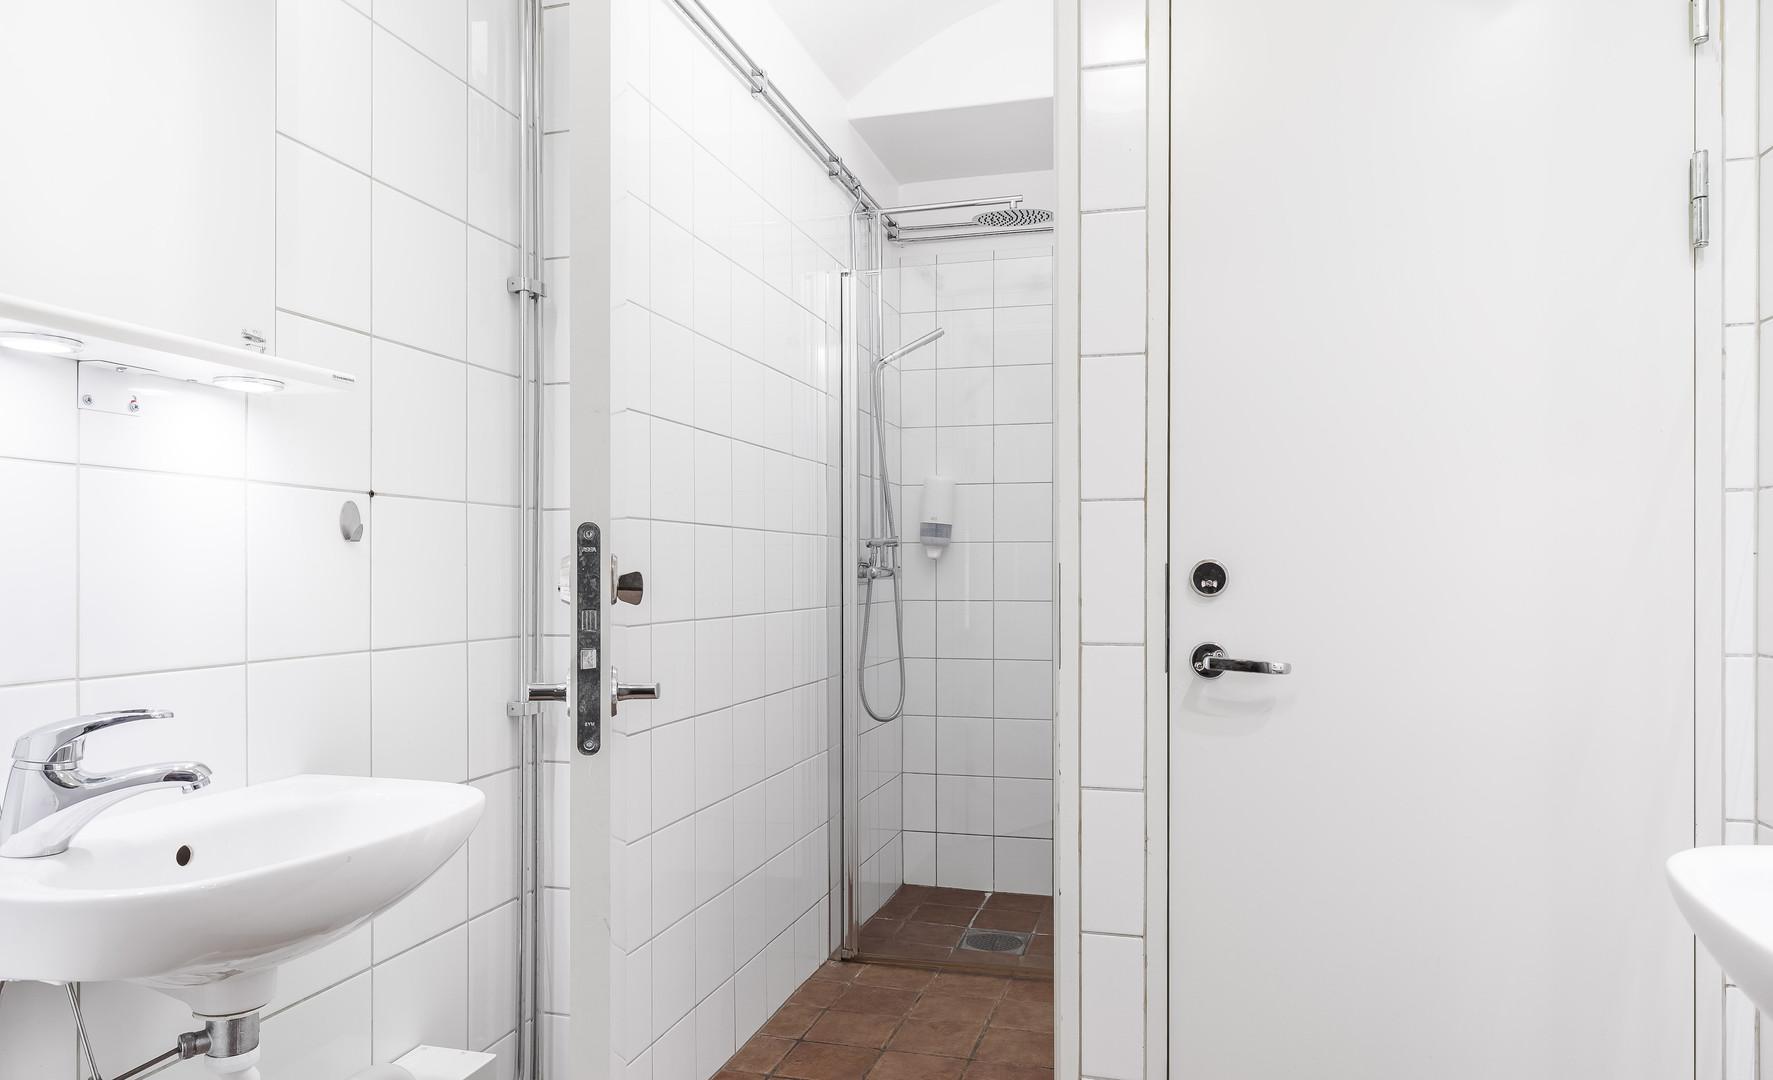 Budget, delad dusch i korridorr